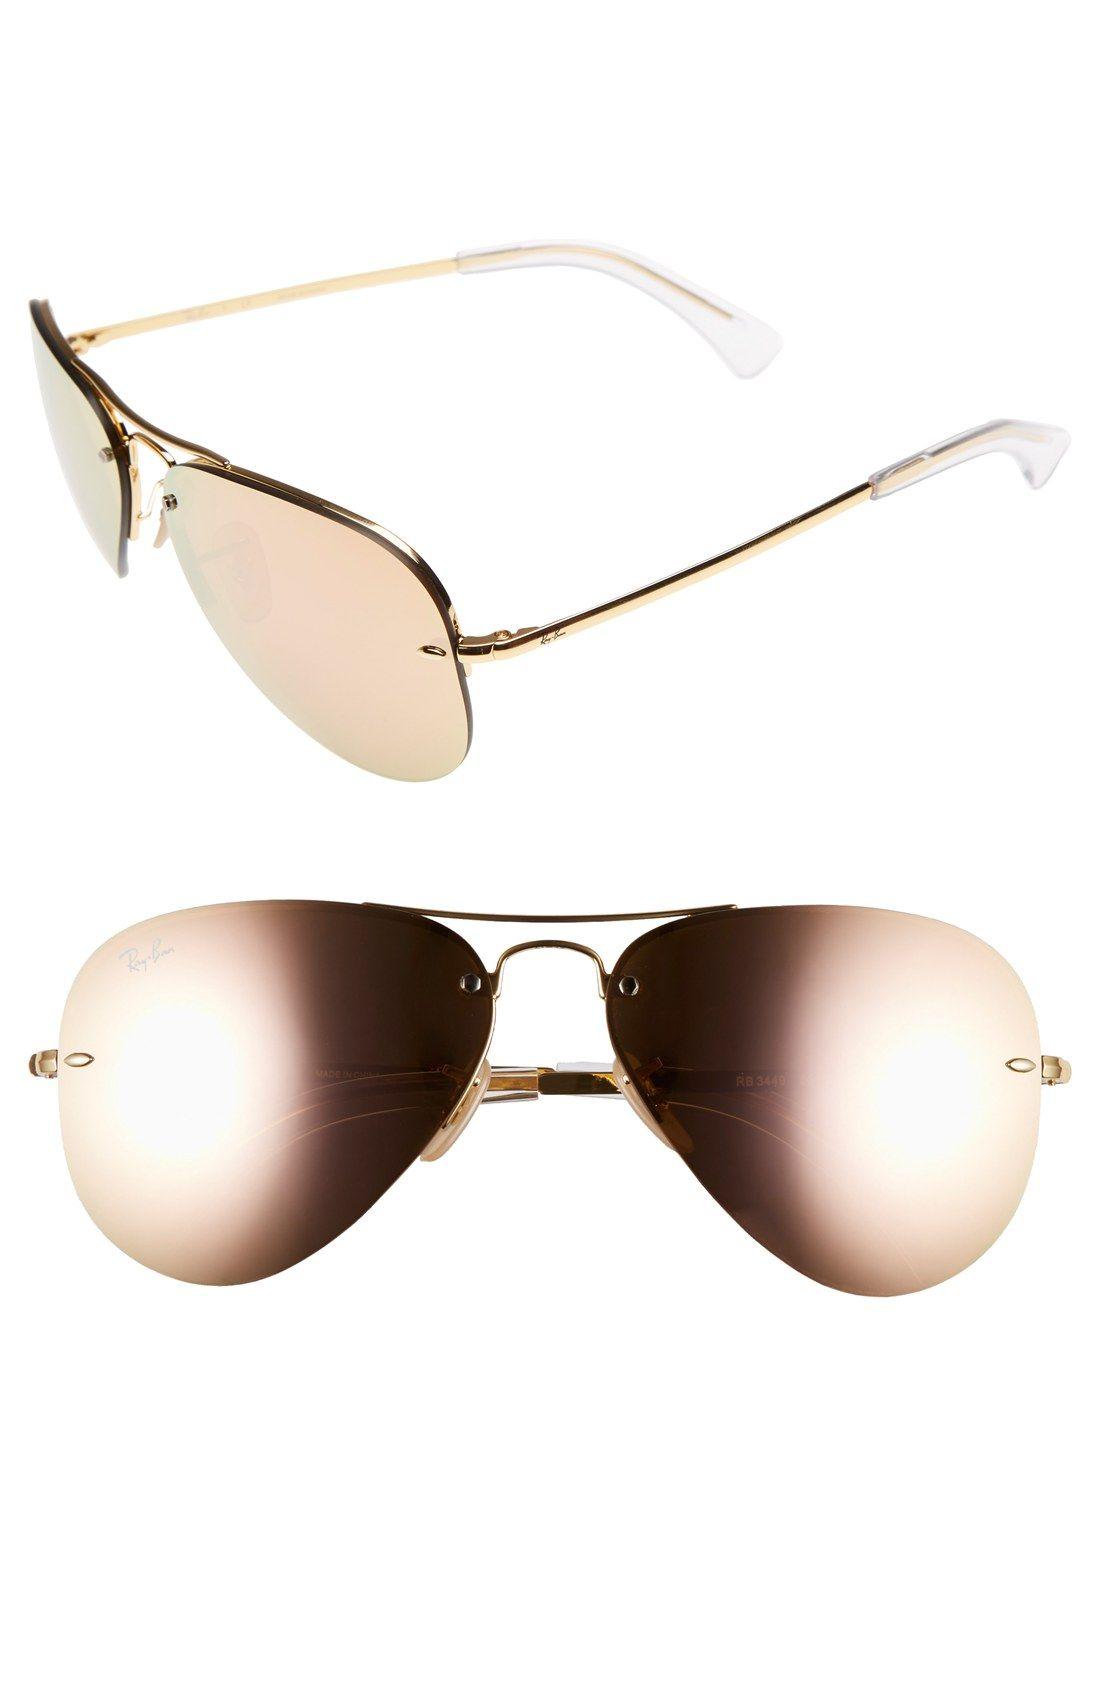 cc8c49ac99d Ray-Ban 59mm Semi Rimless Aviator Sunglasses in Brown Pink